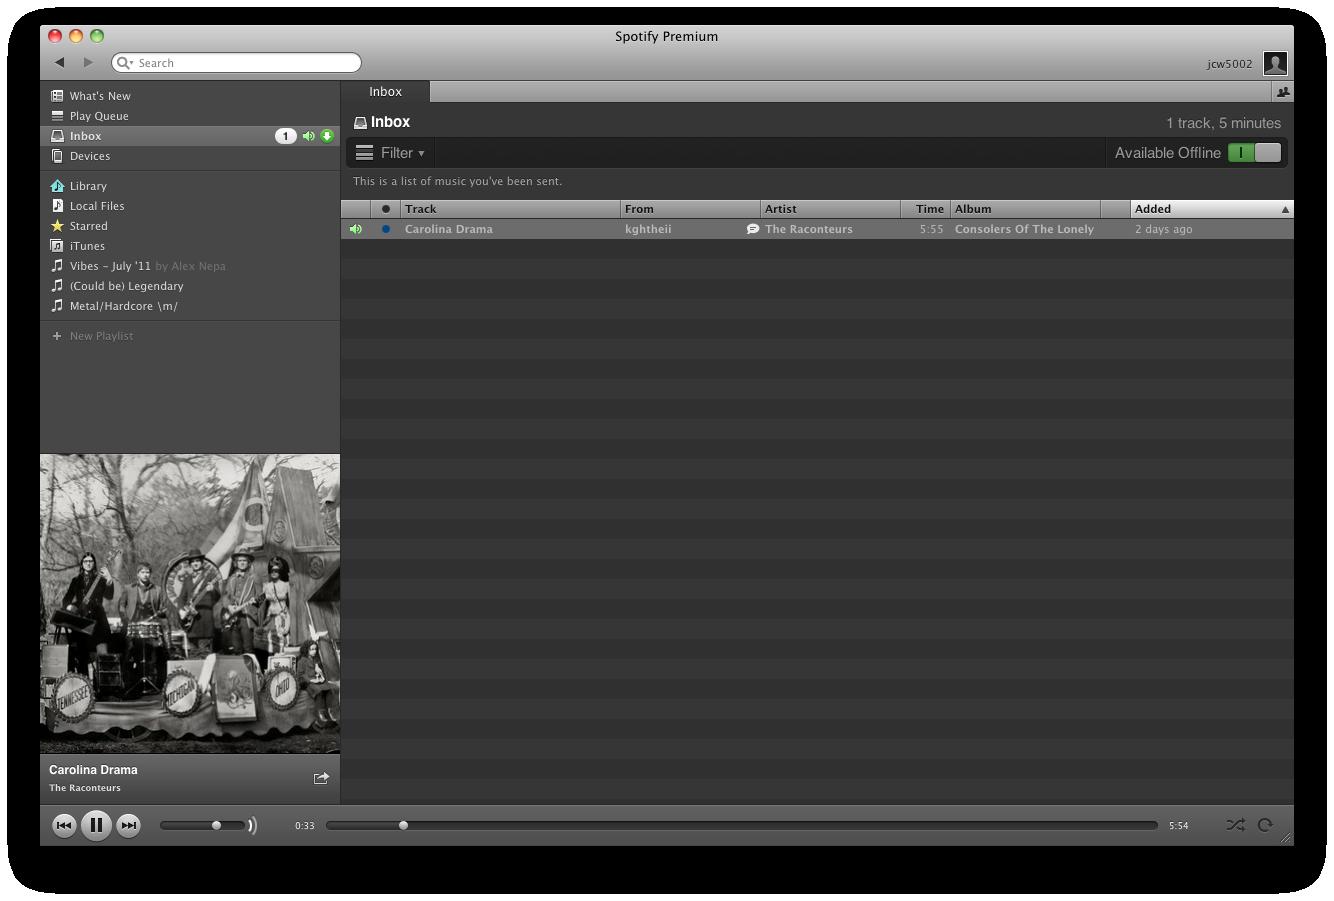 Streaming Music with Spotify   plzkthxbai by Jason Wagner - Spotify Profile